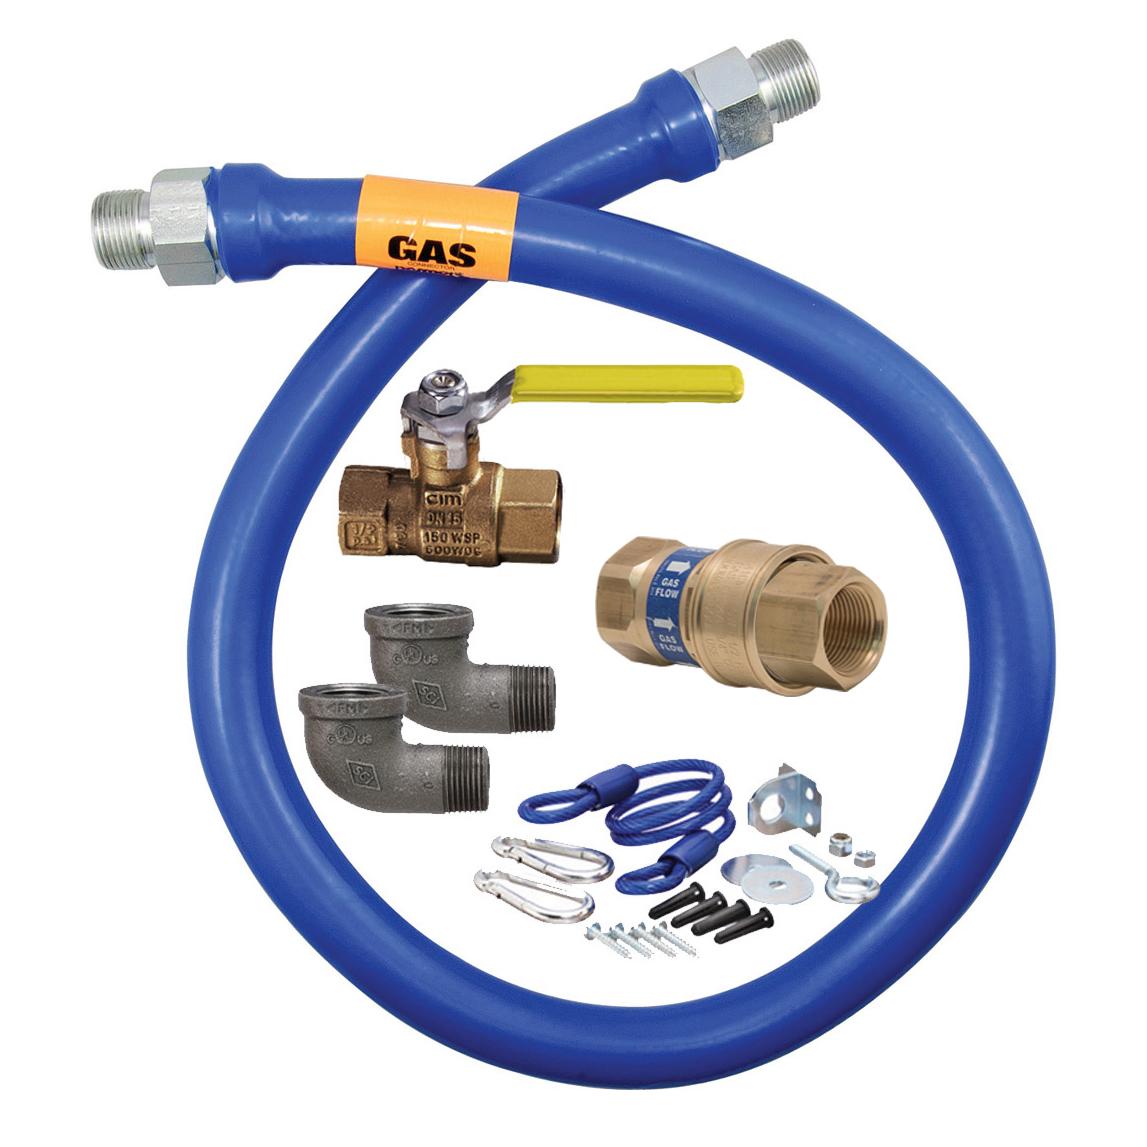 Dormont Manufacturing 1675KITB36 gas connector hose kit